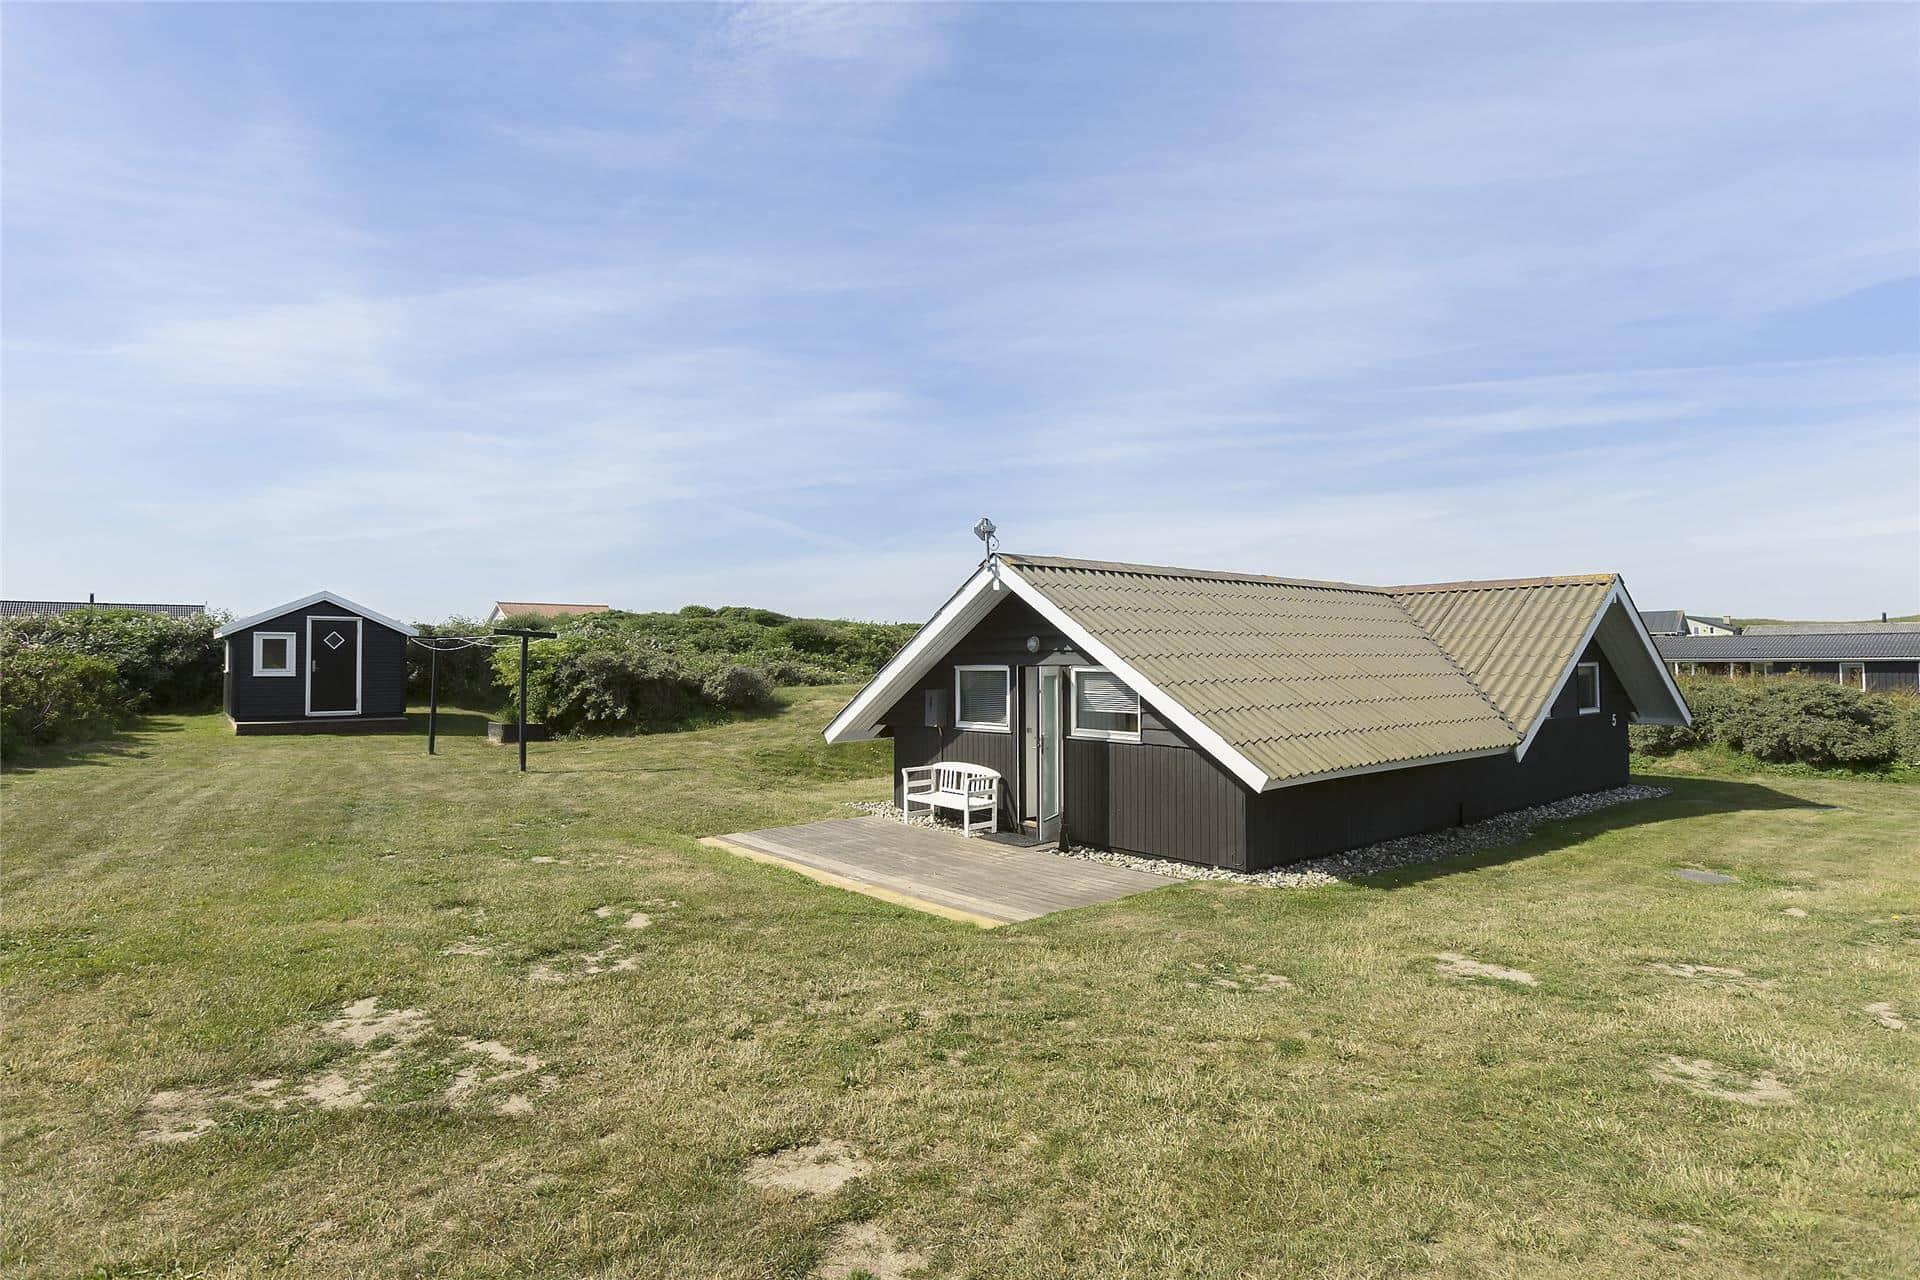 Billede 1-14 Sommerhus 107, Lyngbygårdsvej 5, DK - 9480 Løkken